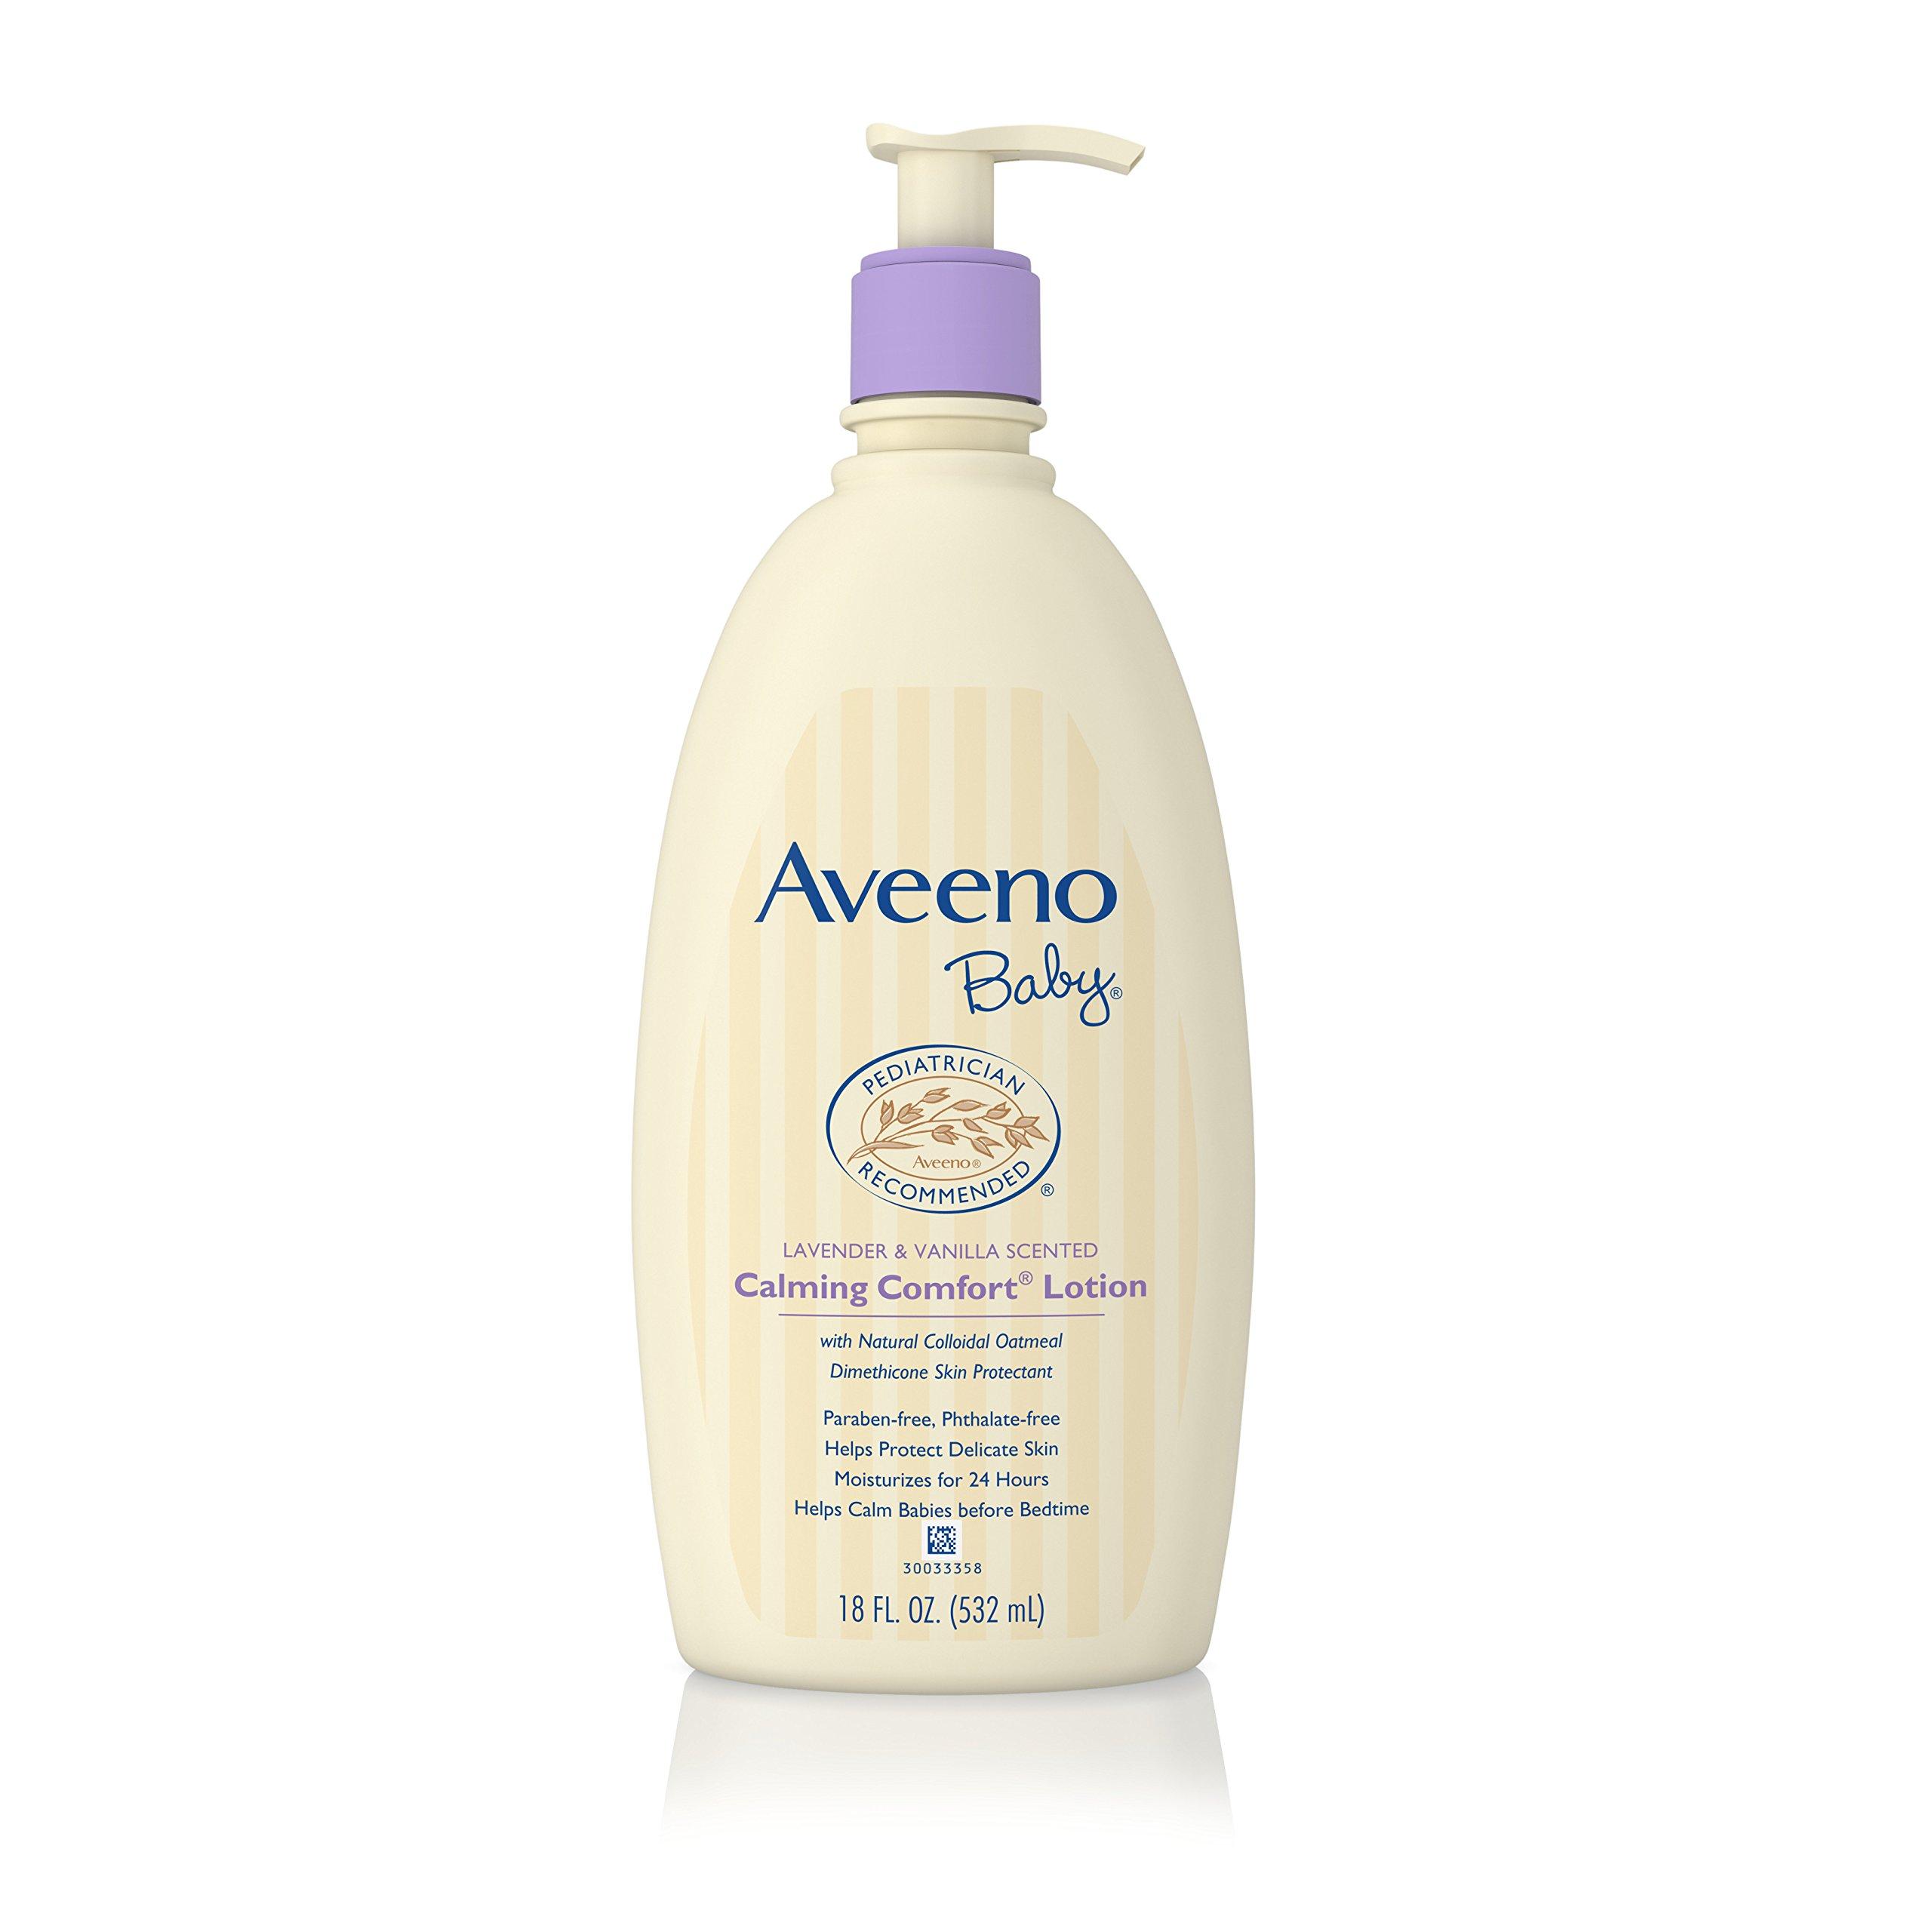 Aveeno Baby Calming Comfort Moisturizing Lotion, Lavender & Vanilla, 18 Oz.